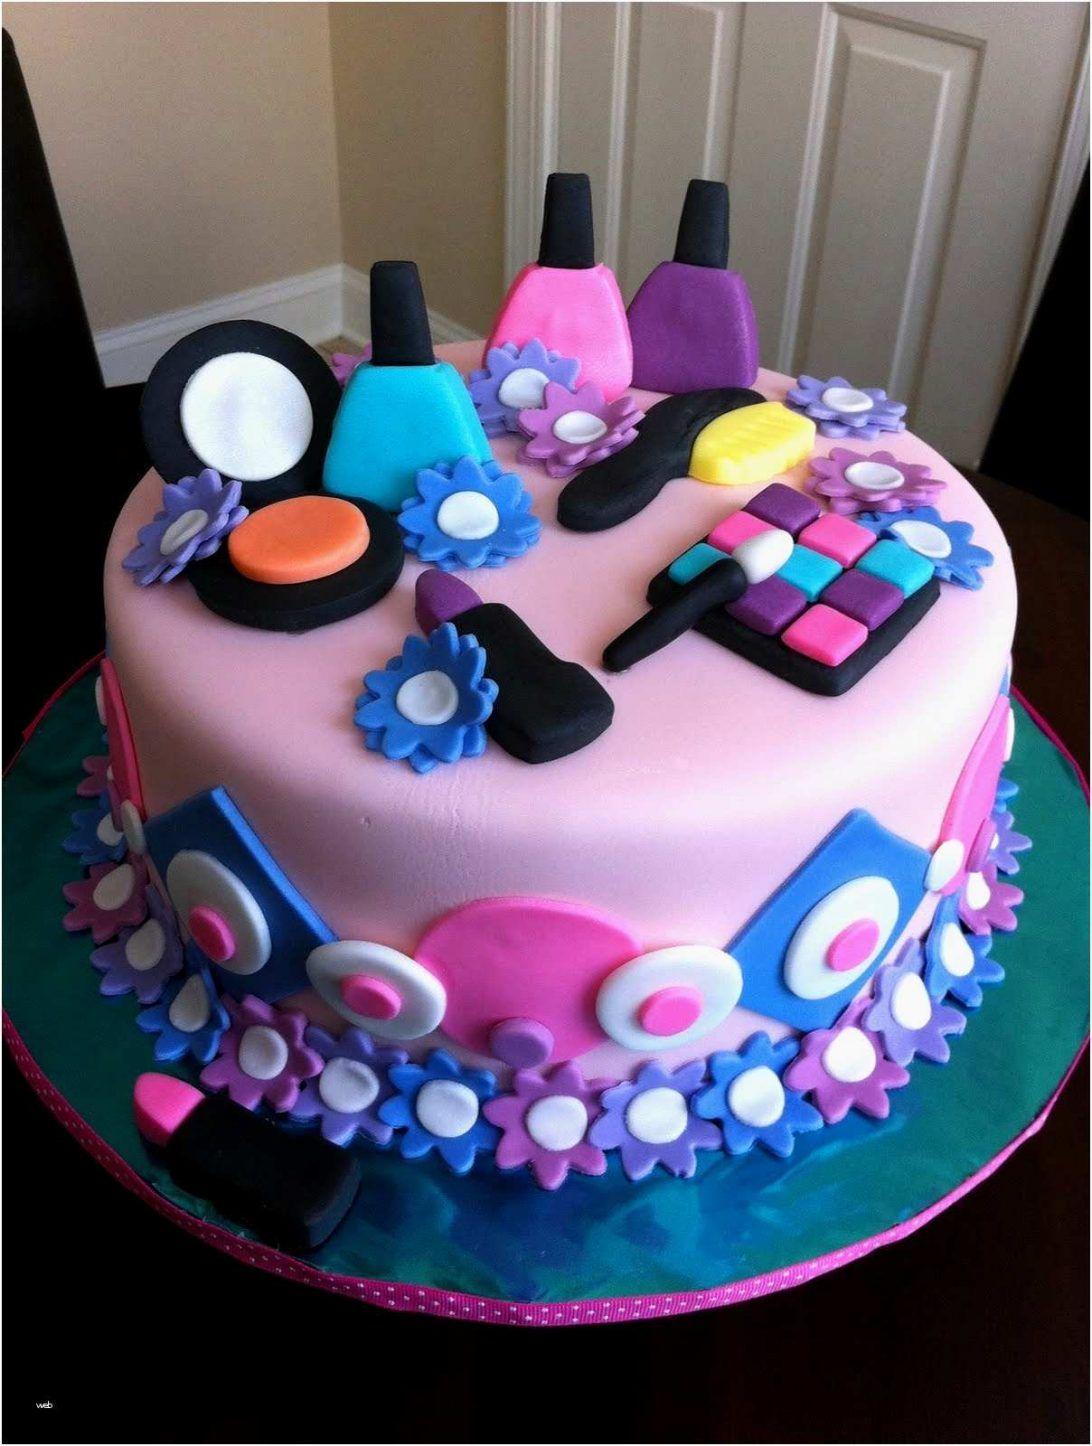 12 Year Old Birthday Party Ideas Birthday Cake Kids Cute